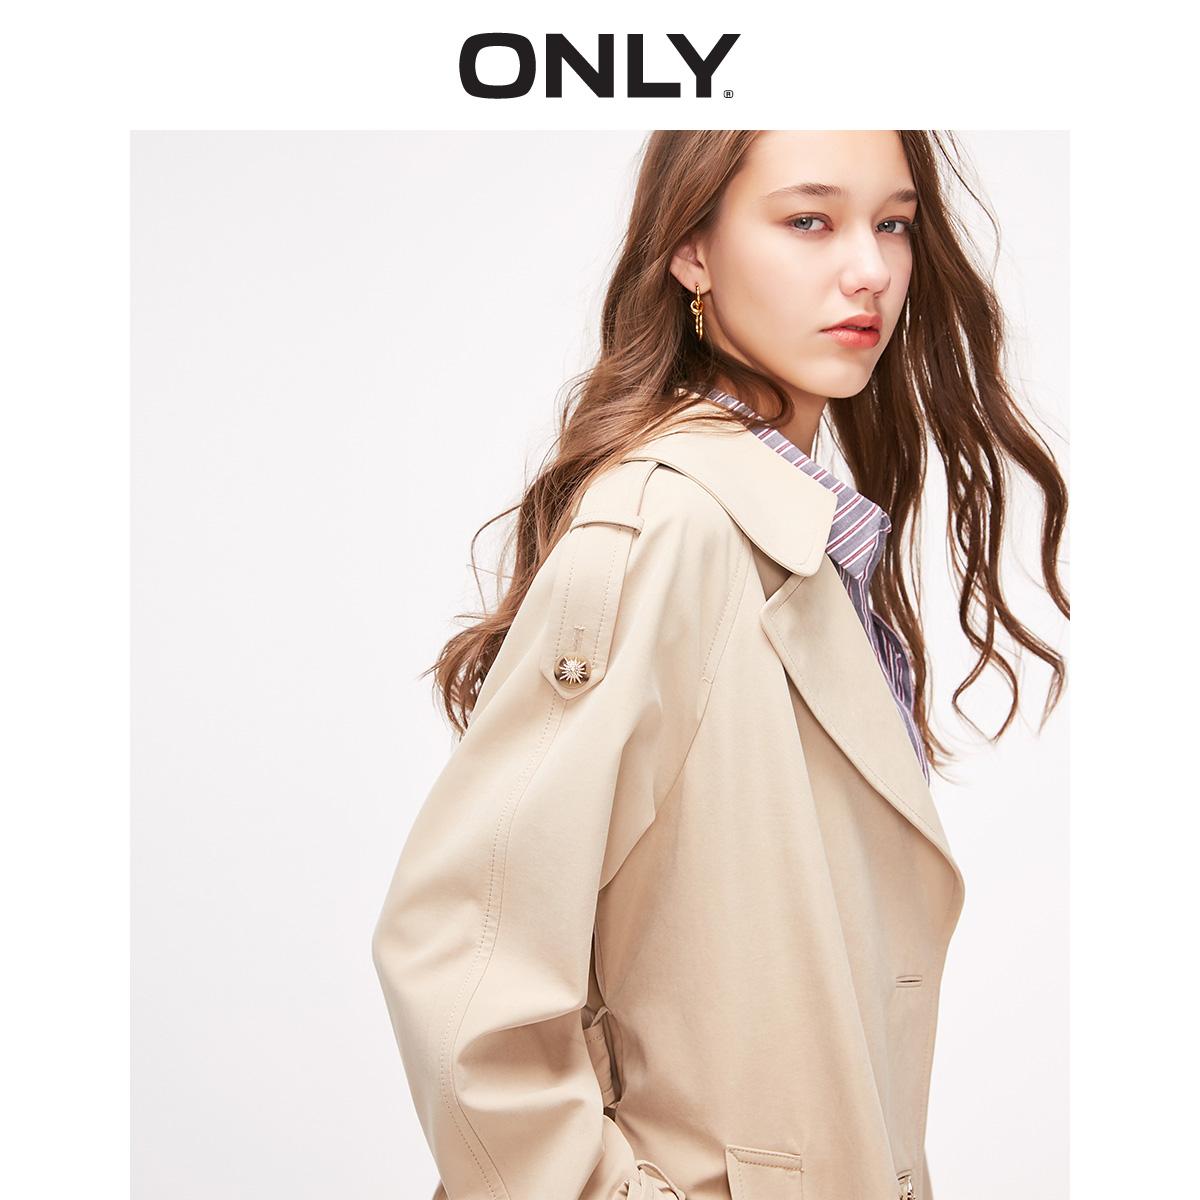 119136502 ONLY  绫致 春夏新款时尚气质英伦洋气薄款长款风衣外套女